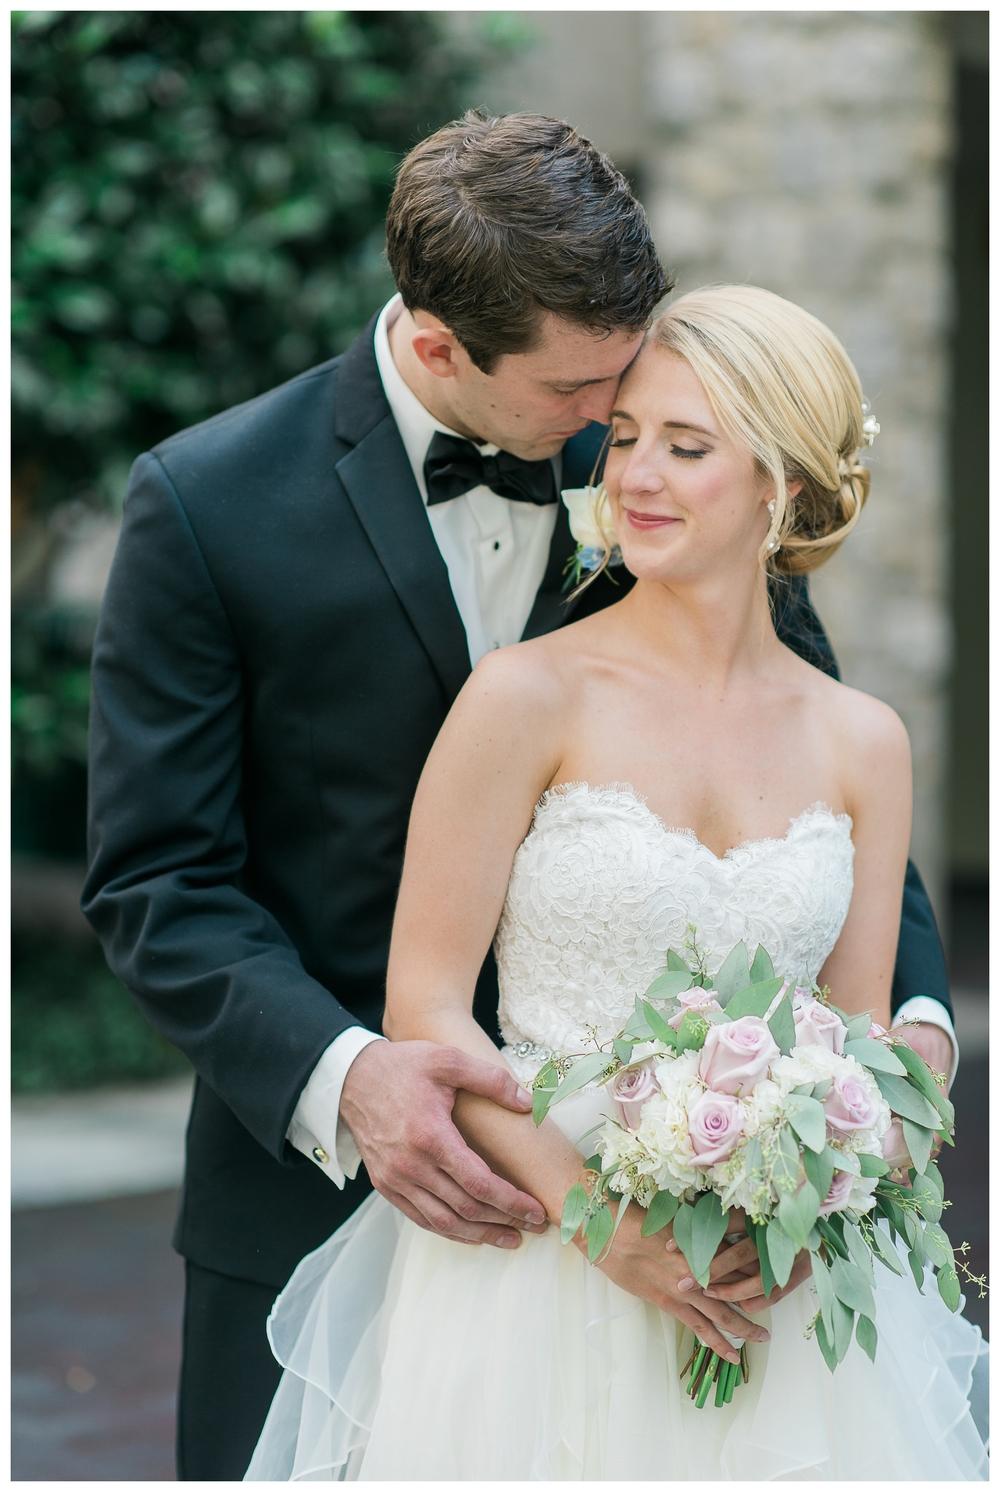 Rebecca_Bridges_Photography_Indianapolis_Wedding_Photographer_4550.jpg